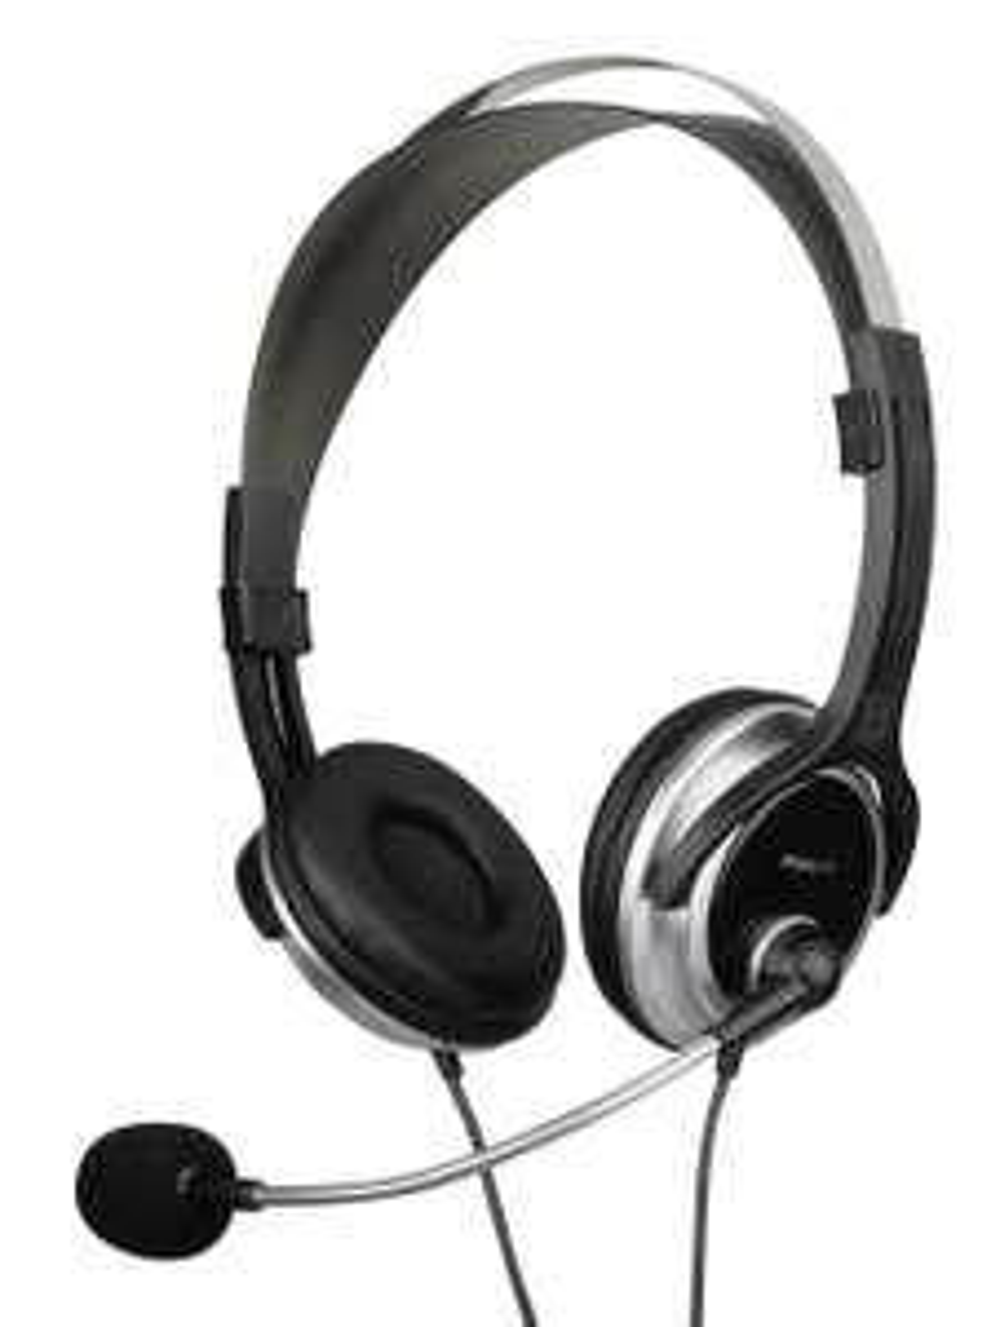 [Amazon Prime] Headset Speedlink Chronos (SL-8728-SBK-A) für 9,99 EUR